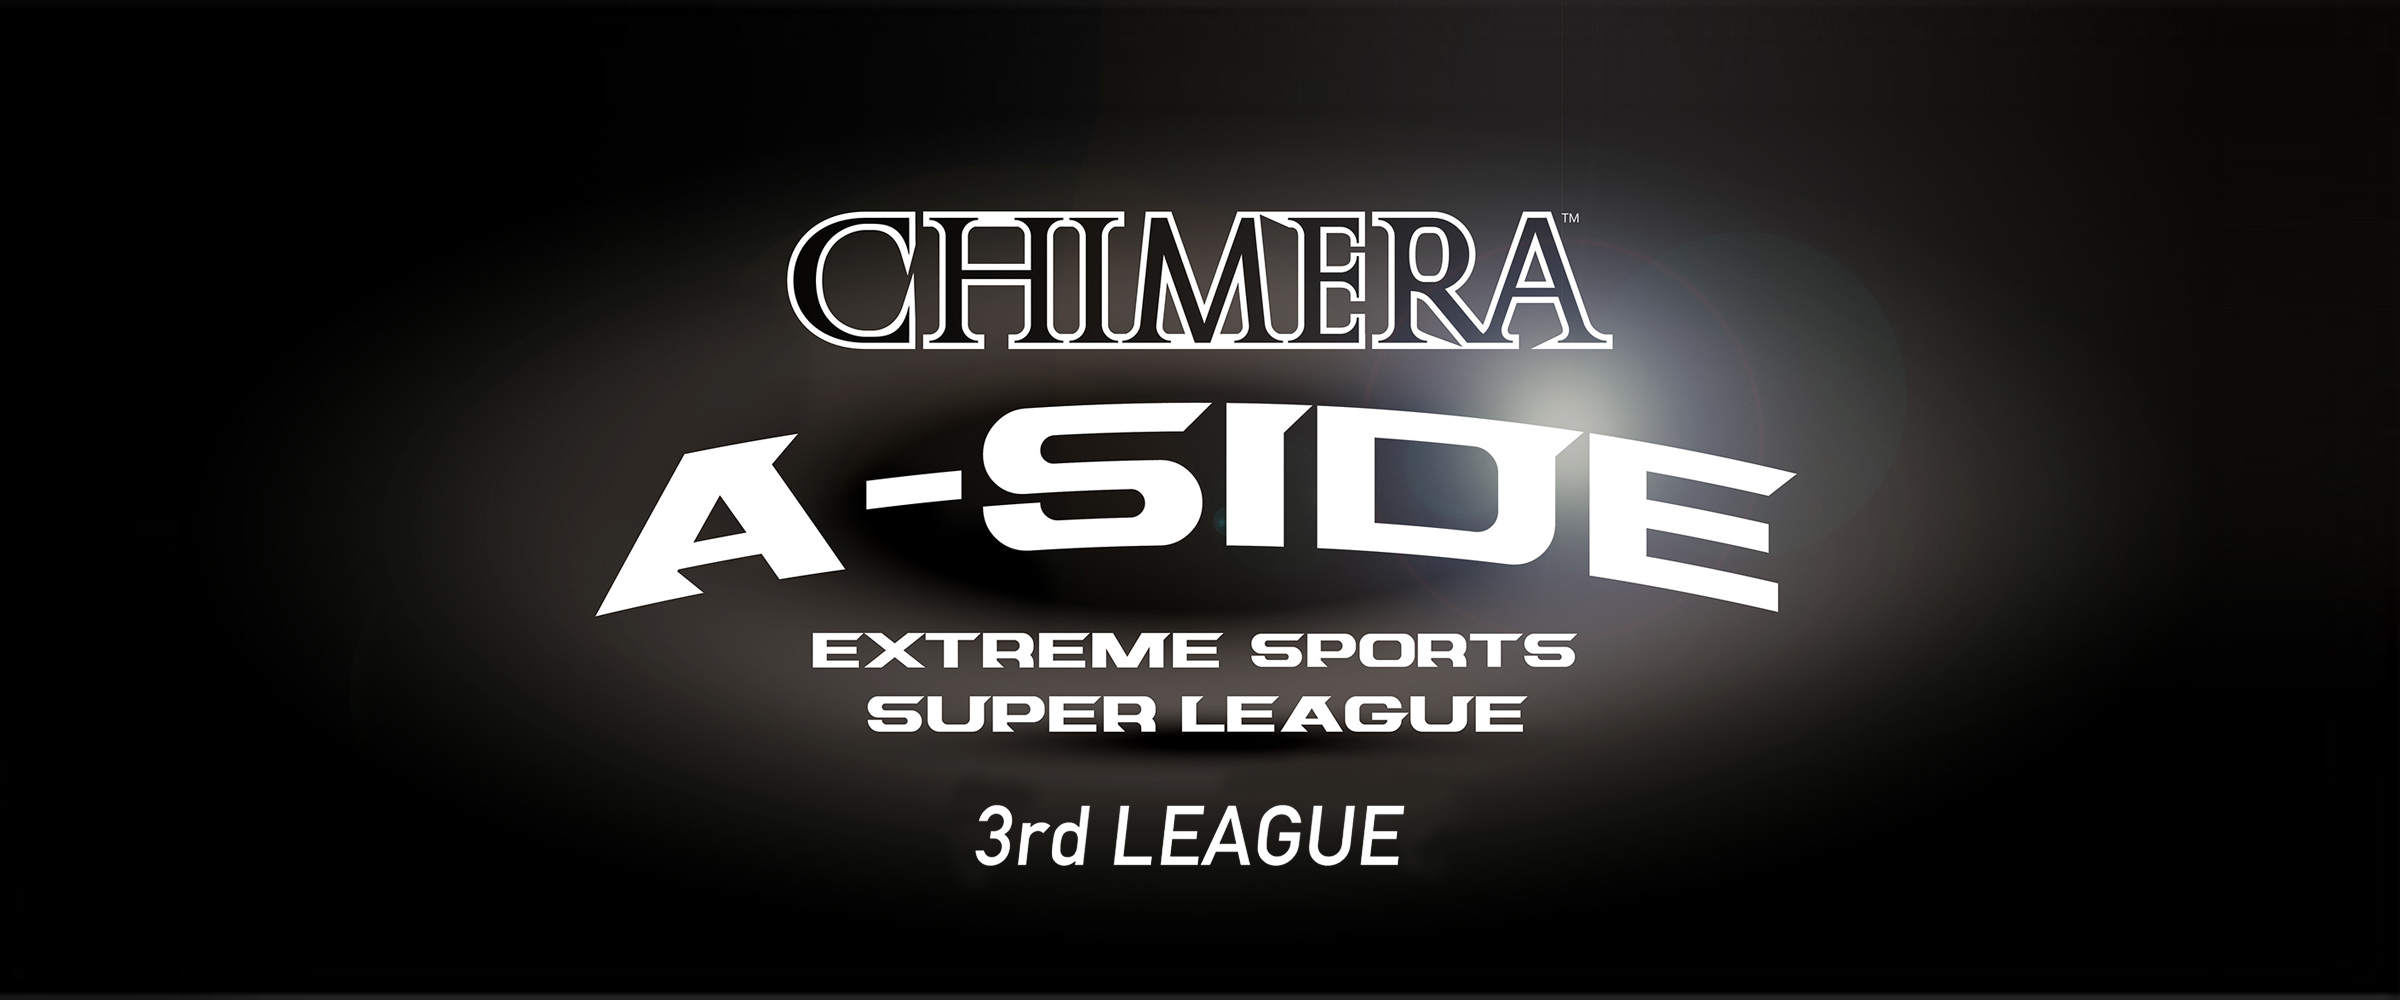 CHIMERA A-SIDEの3rdLEAGUE-2019のスライダーによるキービジュアル